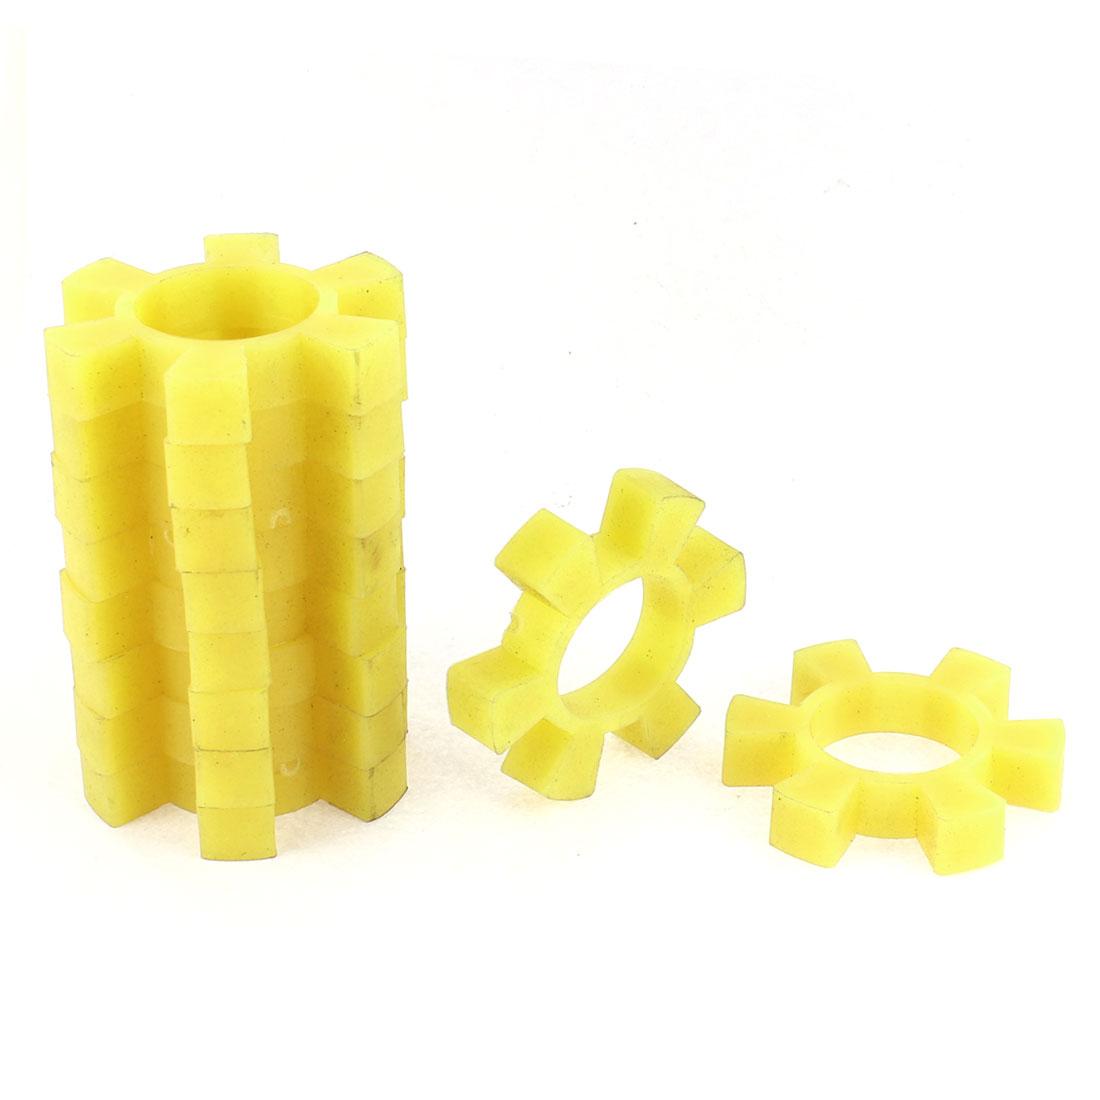 10pcs Coupling Shaft Center Spider Coupler Damper Yellow 42mm Dia Bore